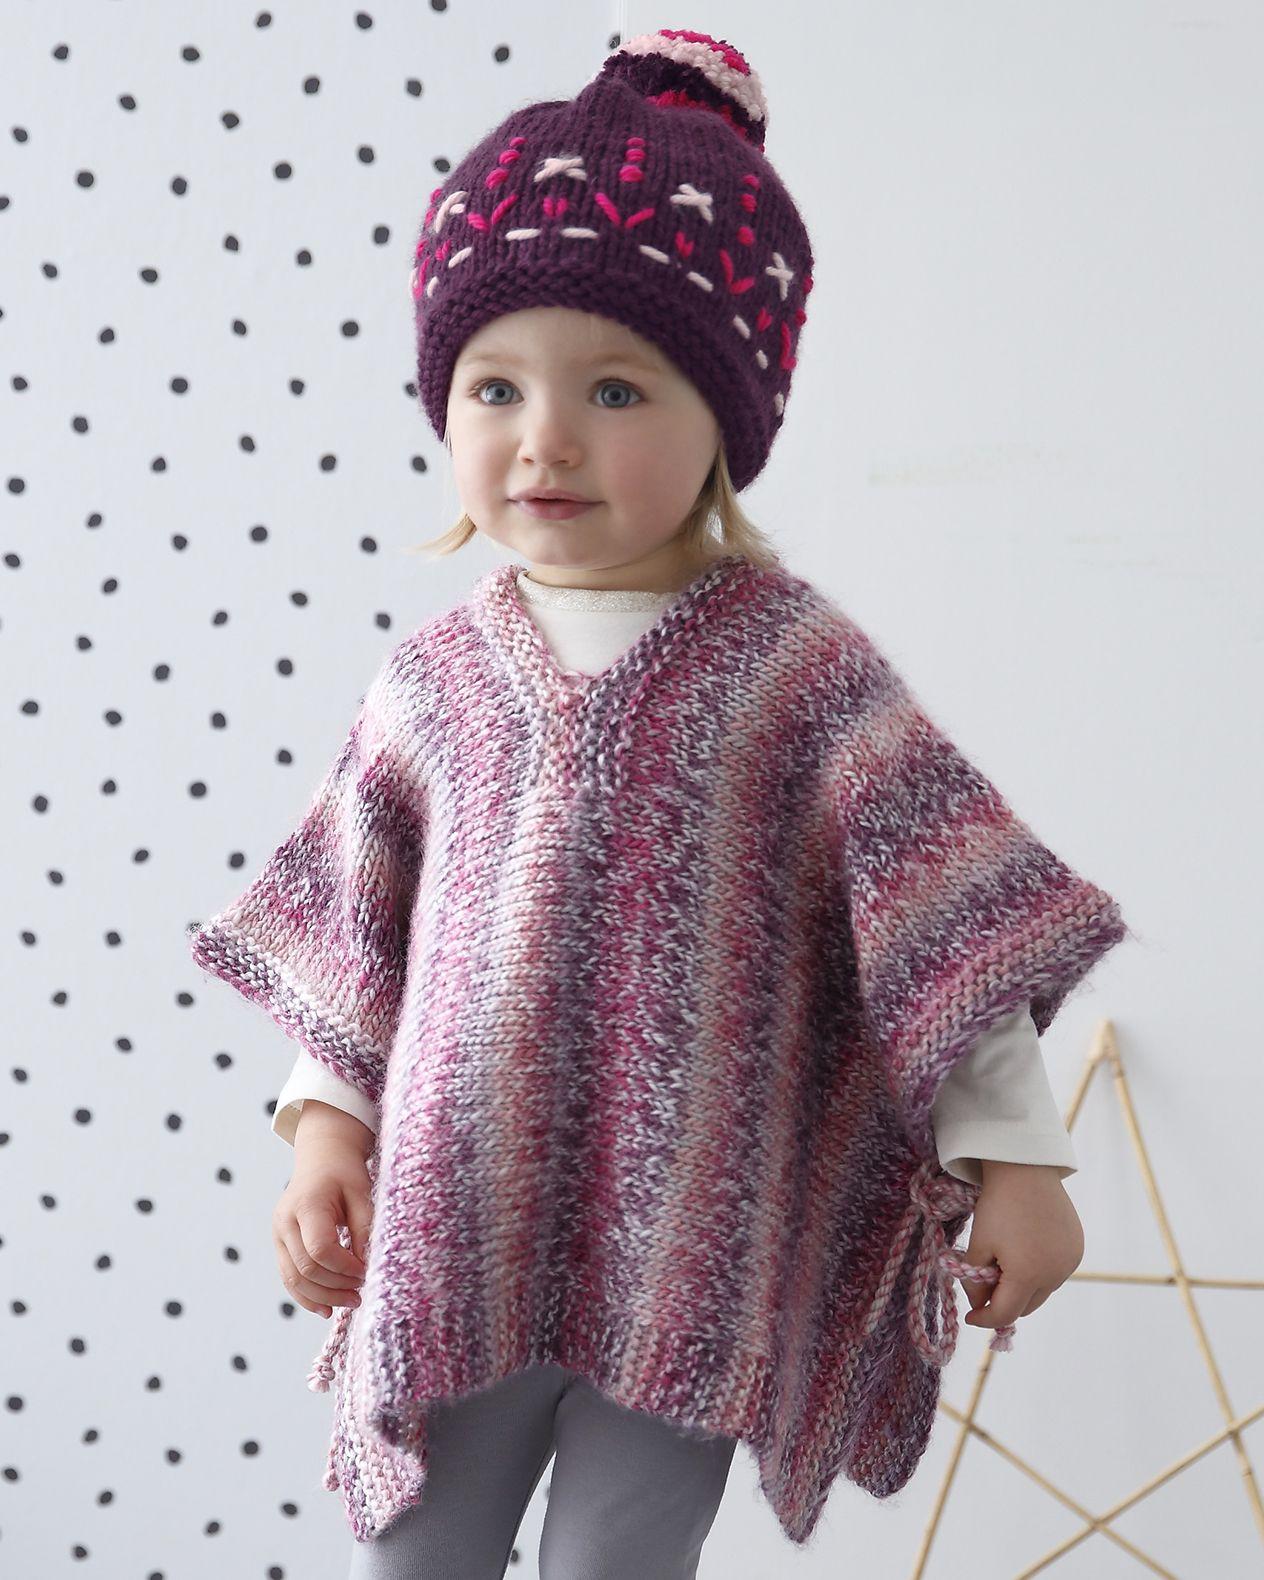 Tricoter Un Poncho Du 2 Ans : tricoter, poncho, Modèle, Poncho, Fille, Madisson, Mikado, Tricot, Facile,, Modele, Gratuit,